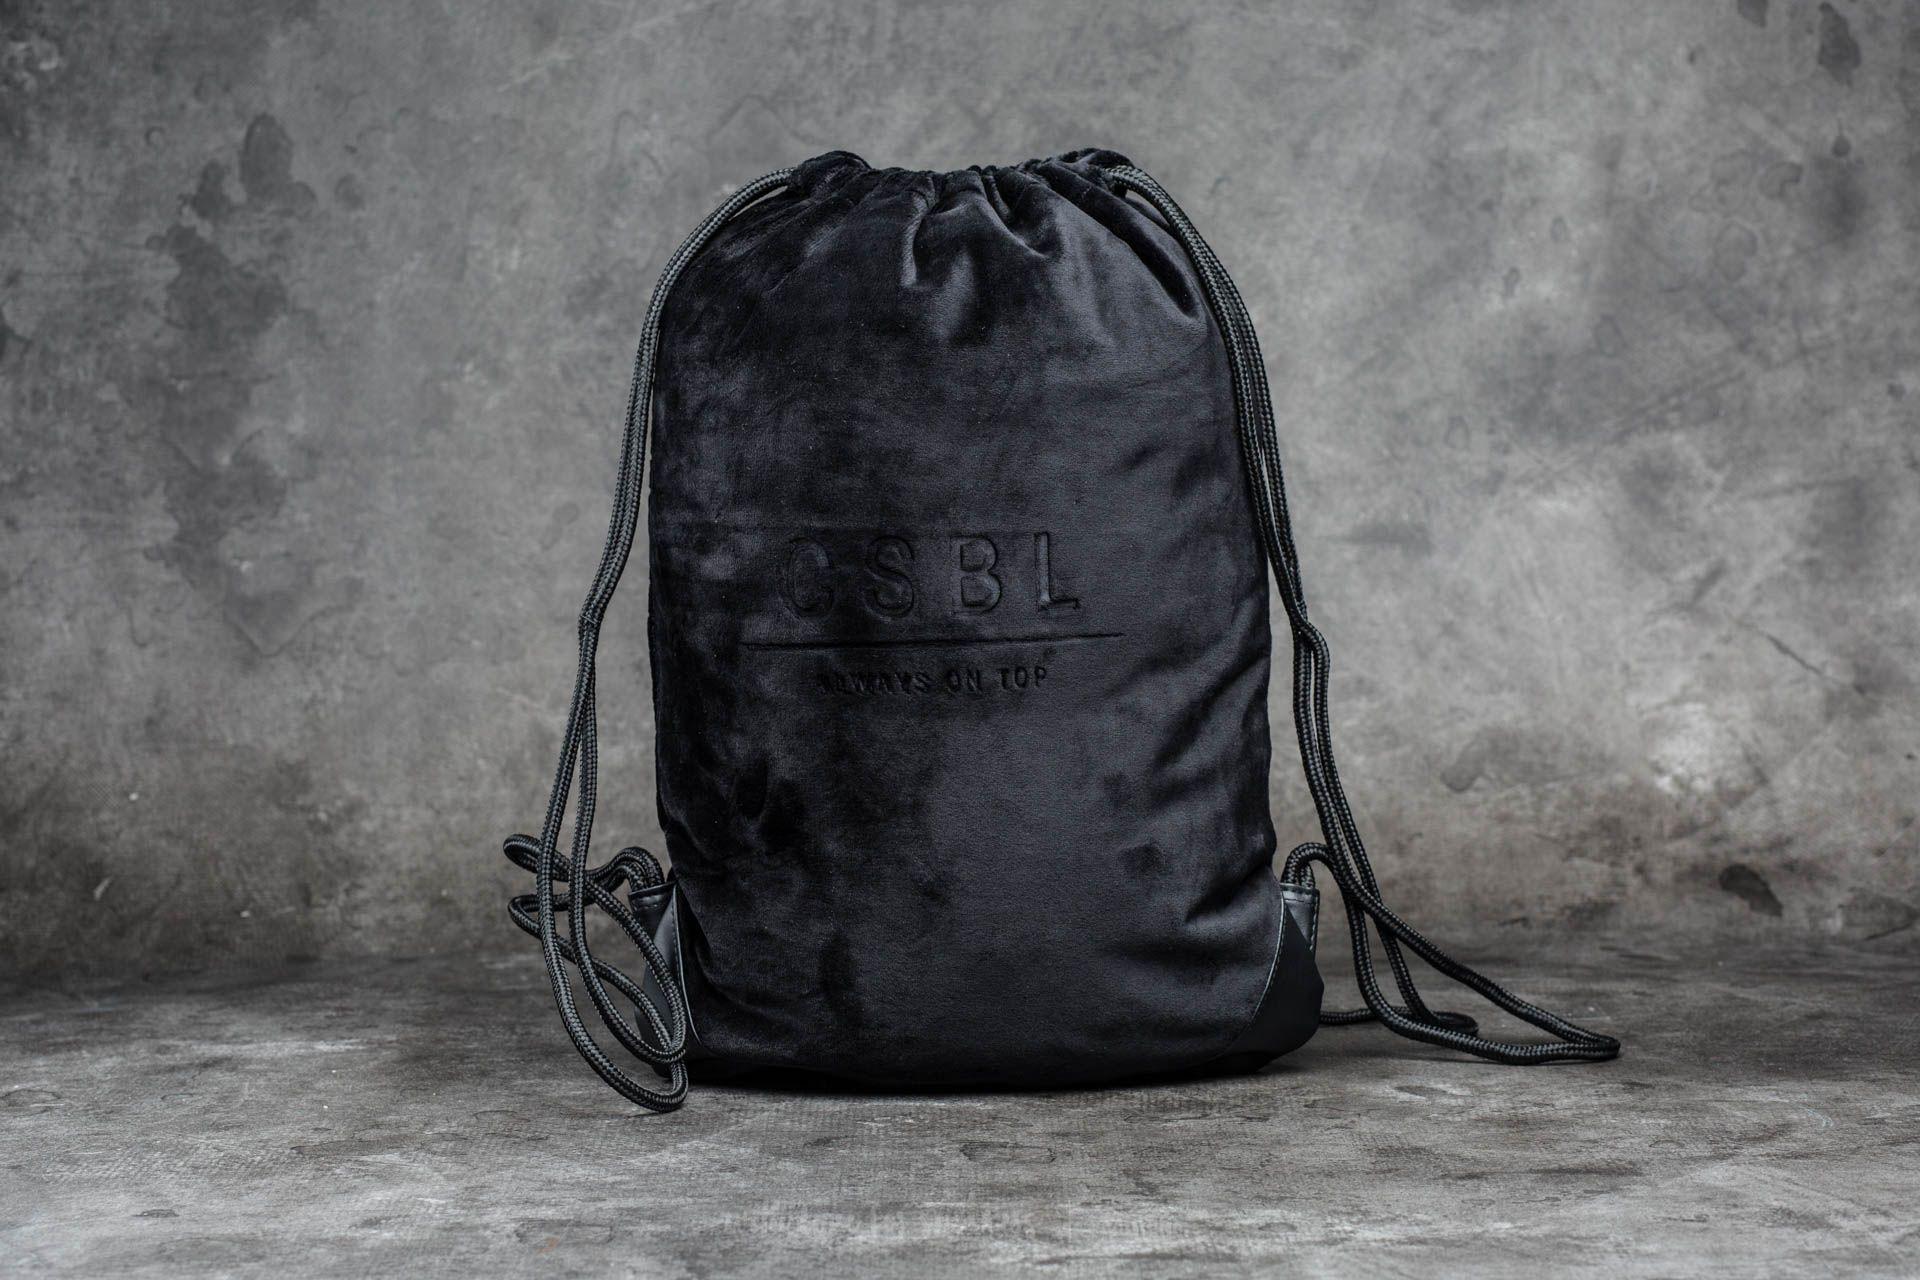 Cayler & Sons CSBL Series Gymbag Black/ White - 12508